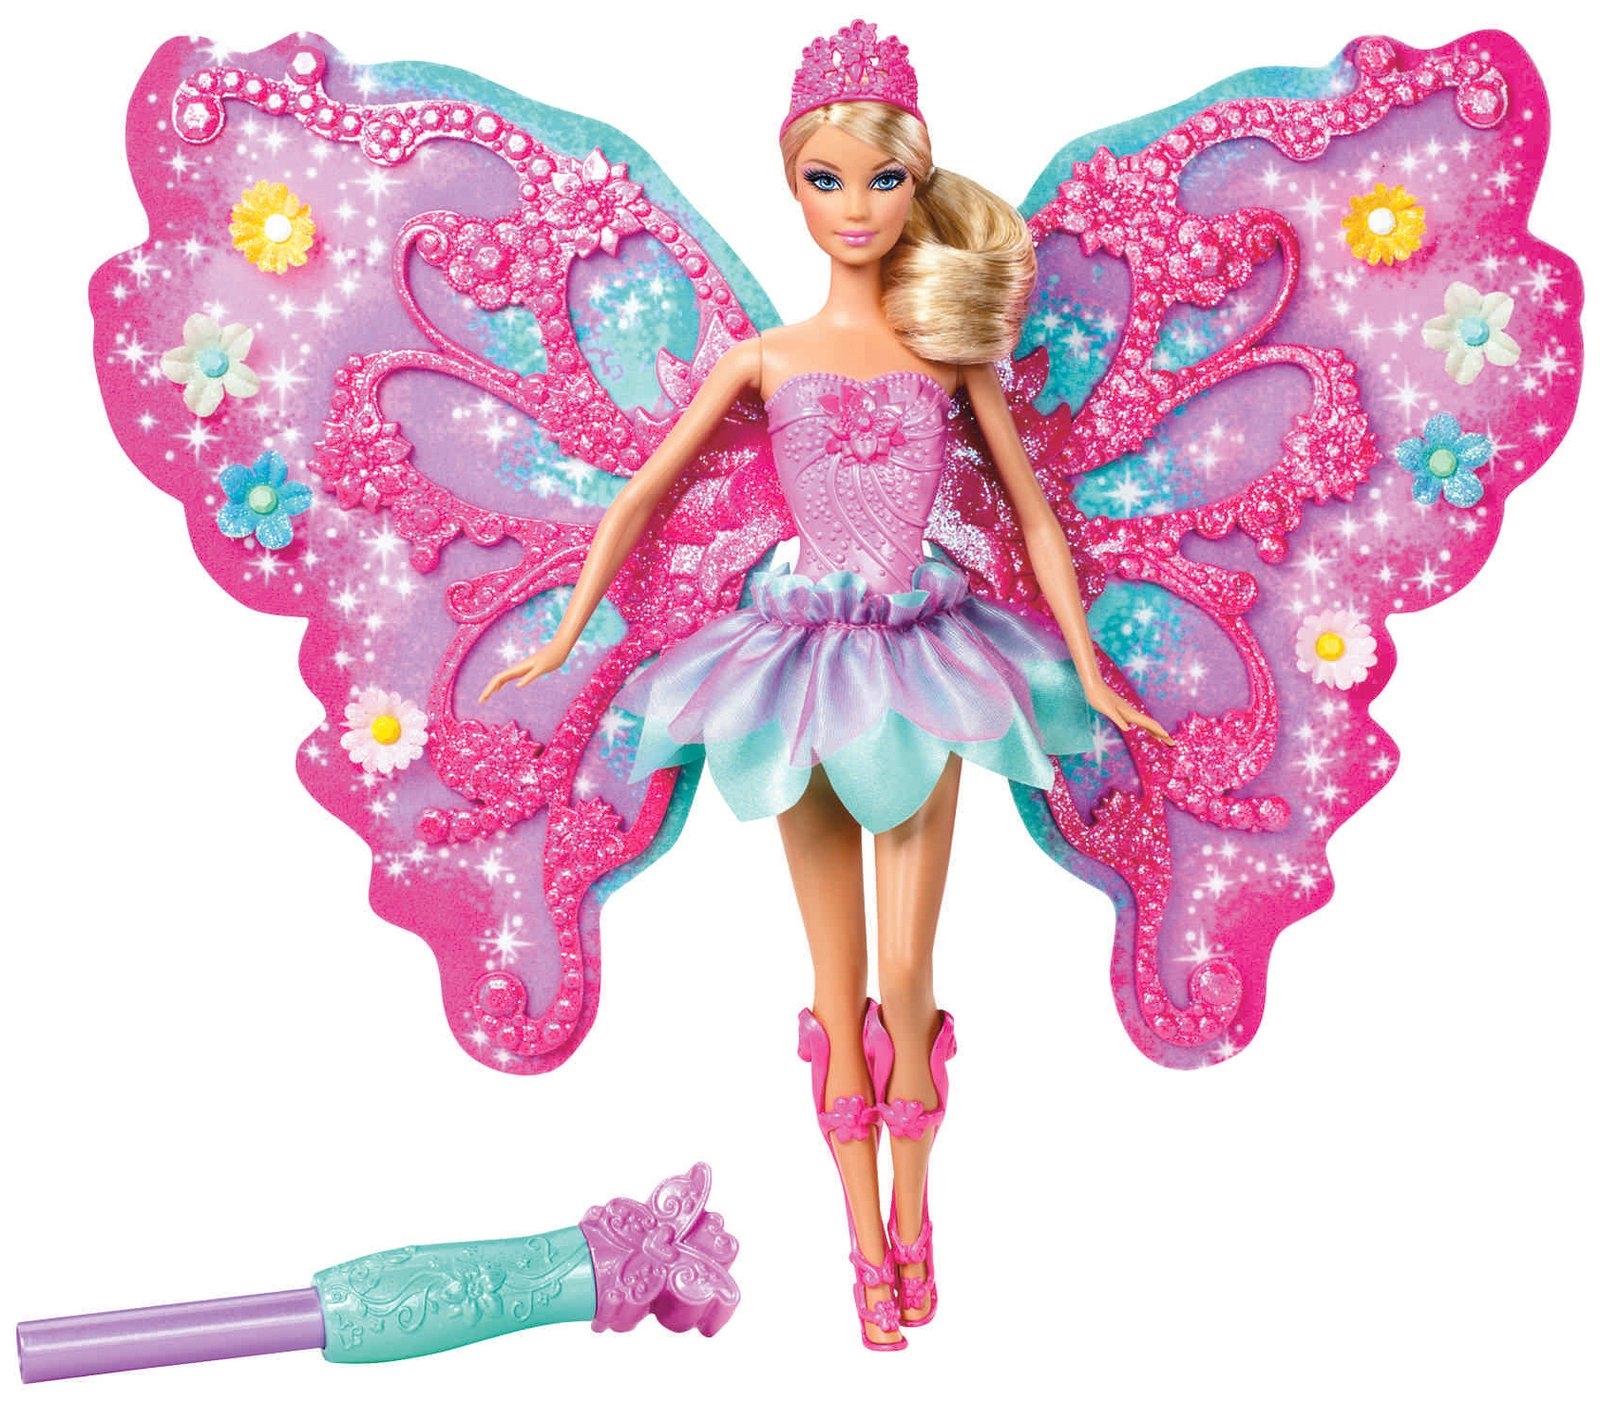 Barbie clipart wing wallpaper  angel barbie image